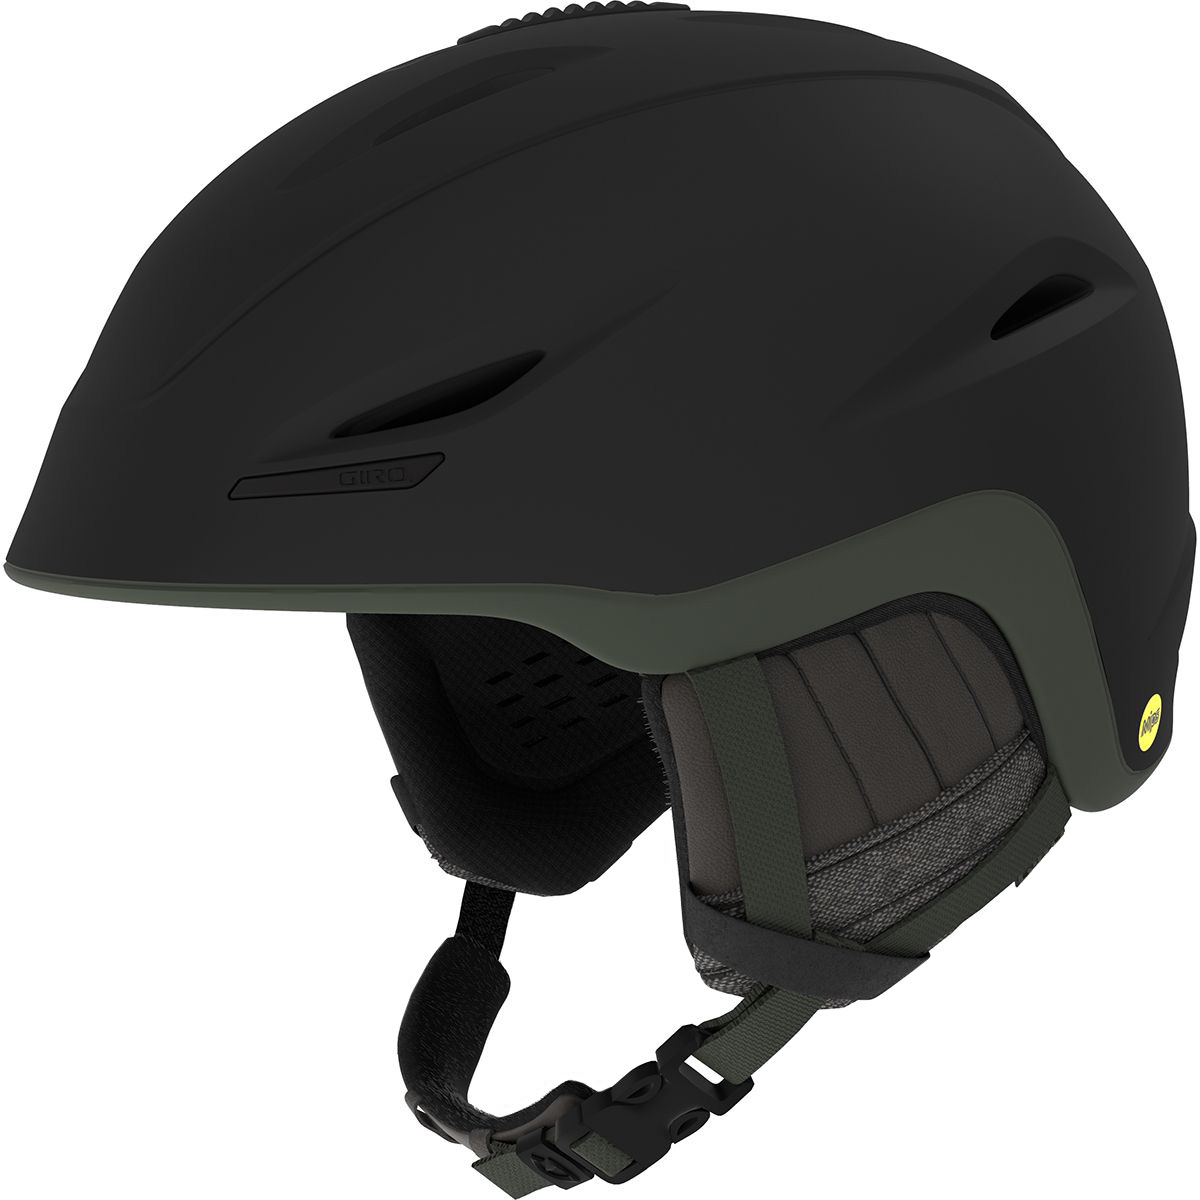 Giro Union Mips Herren Skihelm schwarz oliv matt Gr. M 55,5 - 59 cm